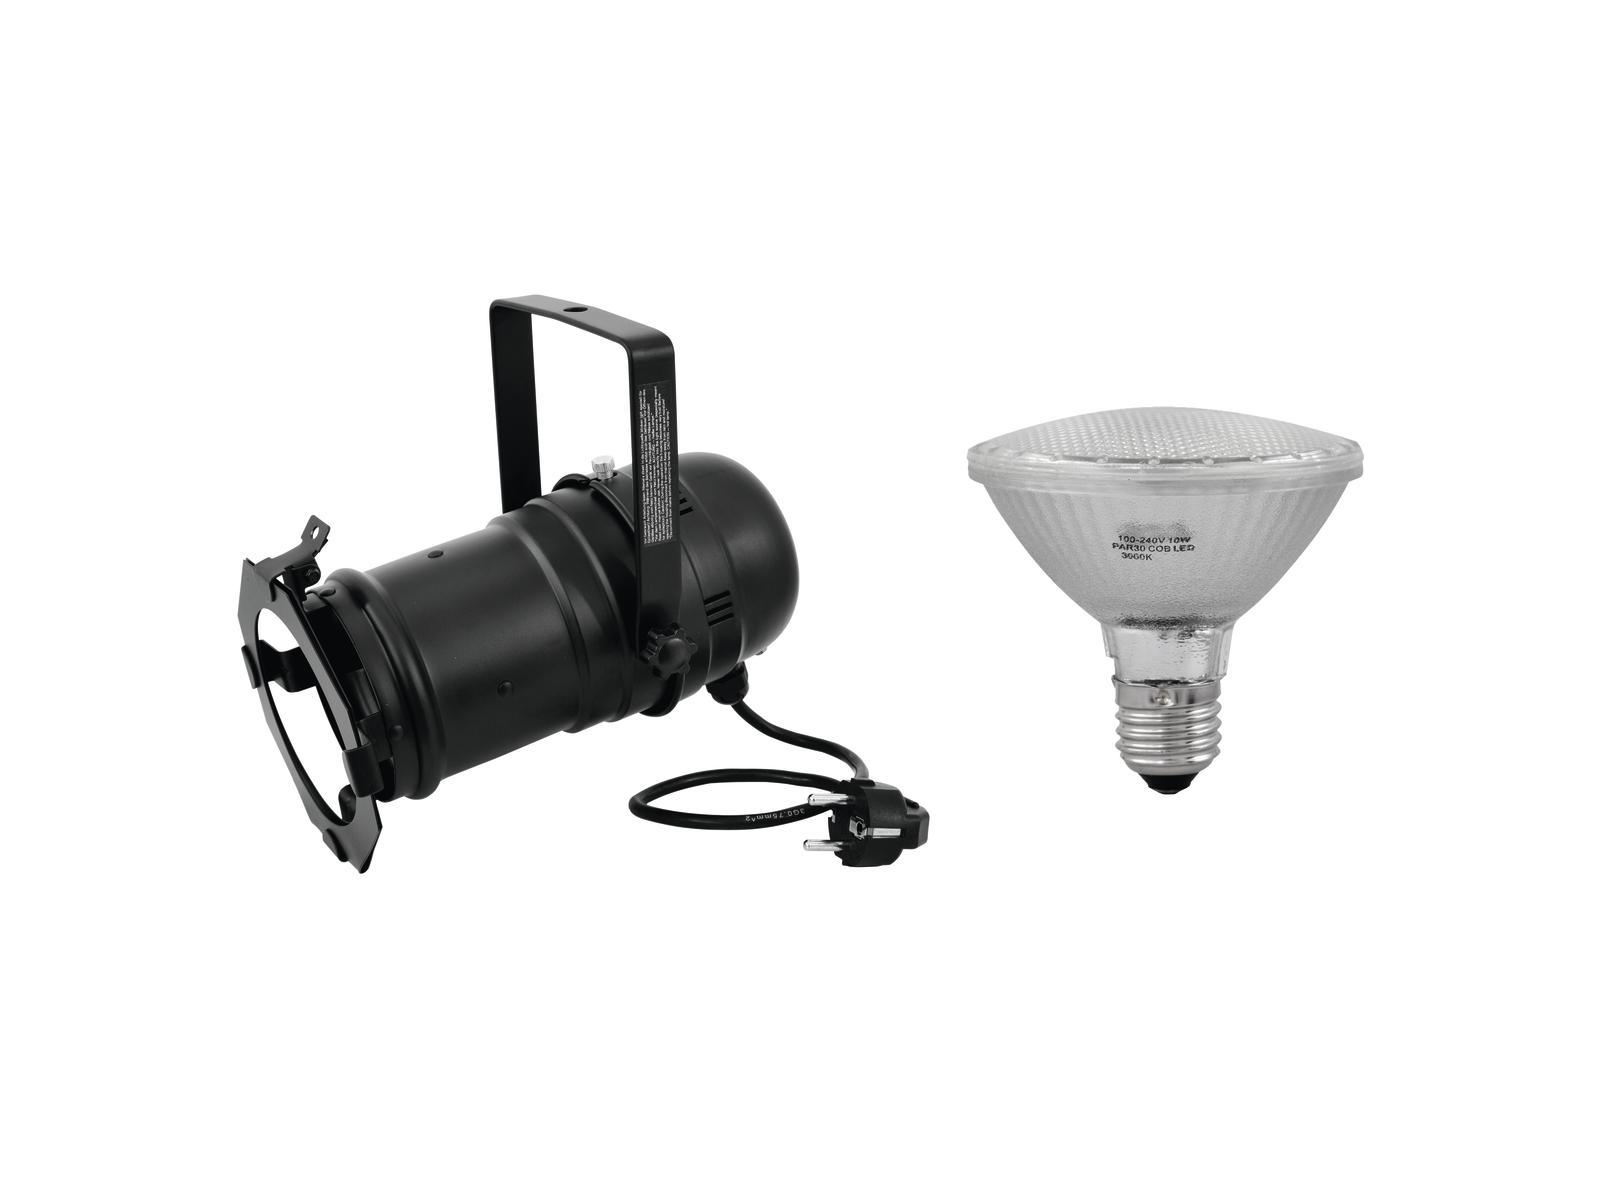 EUROLITE Impostare PAR-30 Spot bk + PAR-30 230V COB 10W E-27 LED 2700K